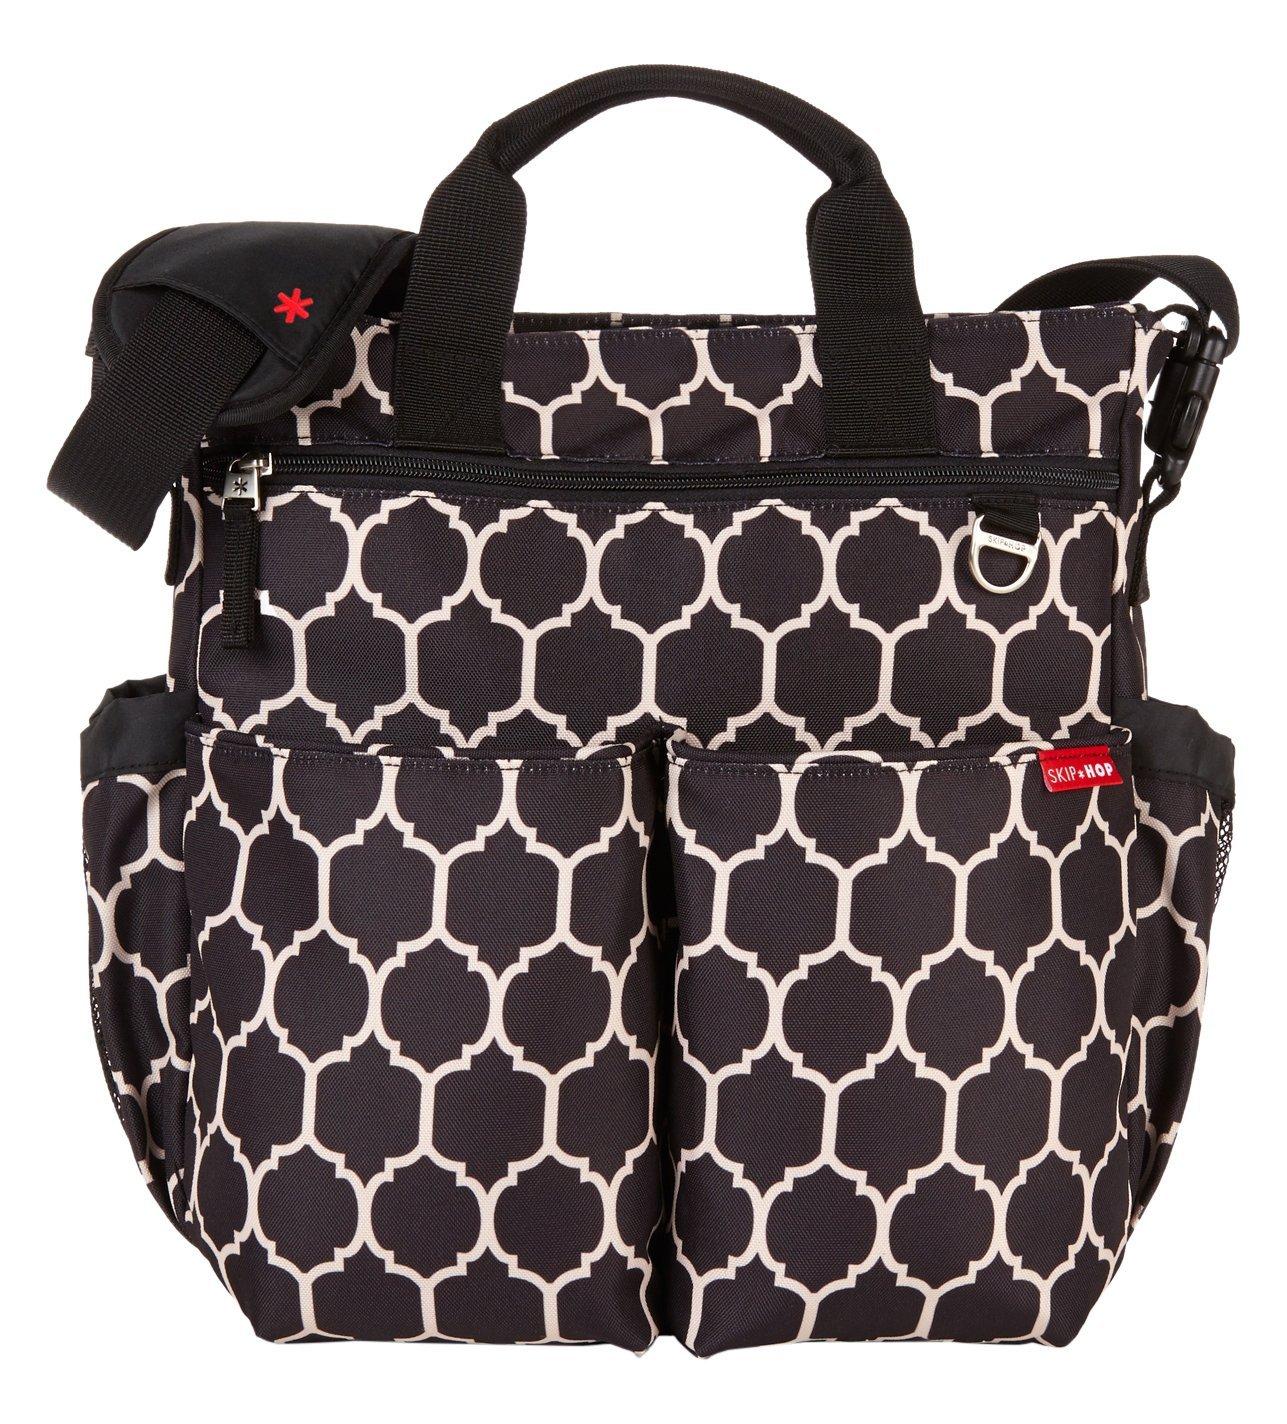 Skip Hop Duo Signature Diaper Bag Onyx Tile 18